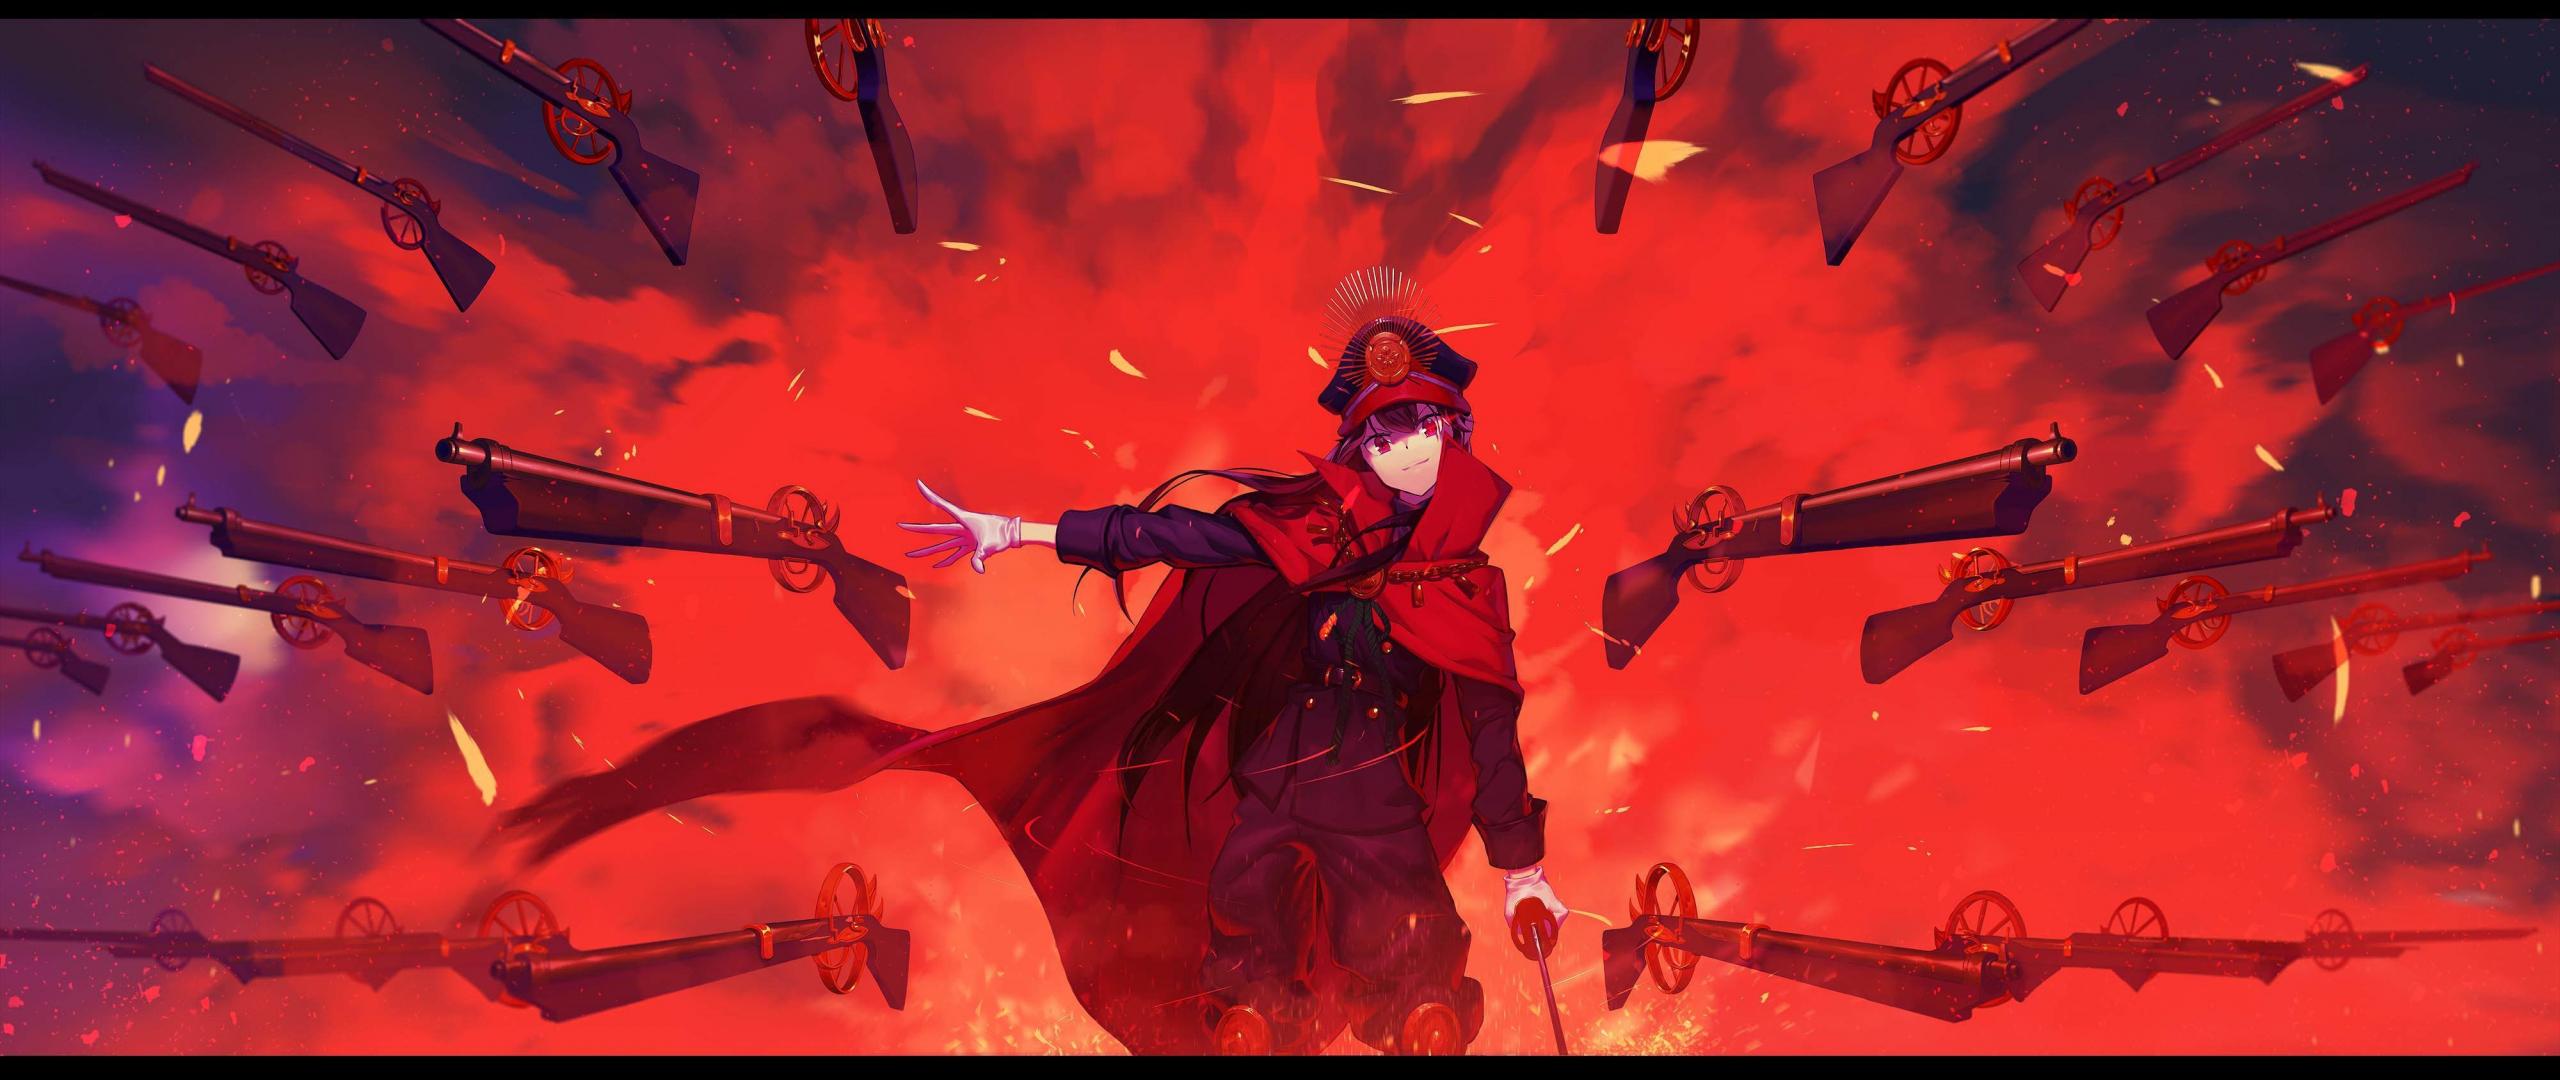 Download 2560x1080 Wallpaper Anime Girl Oda Nobukatsu Fate Grand